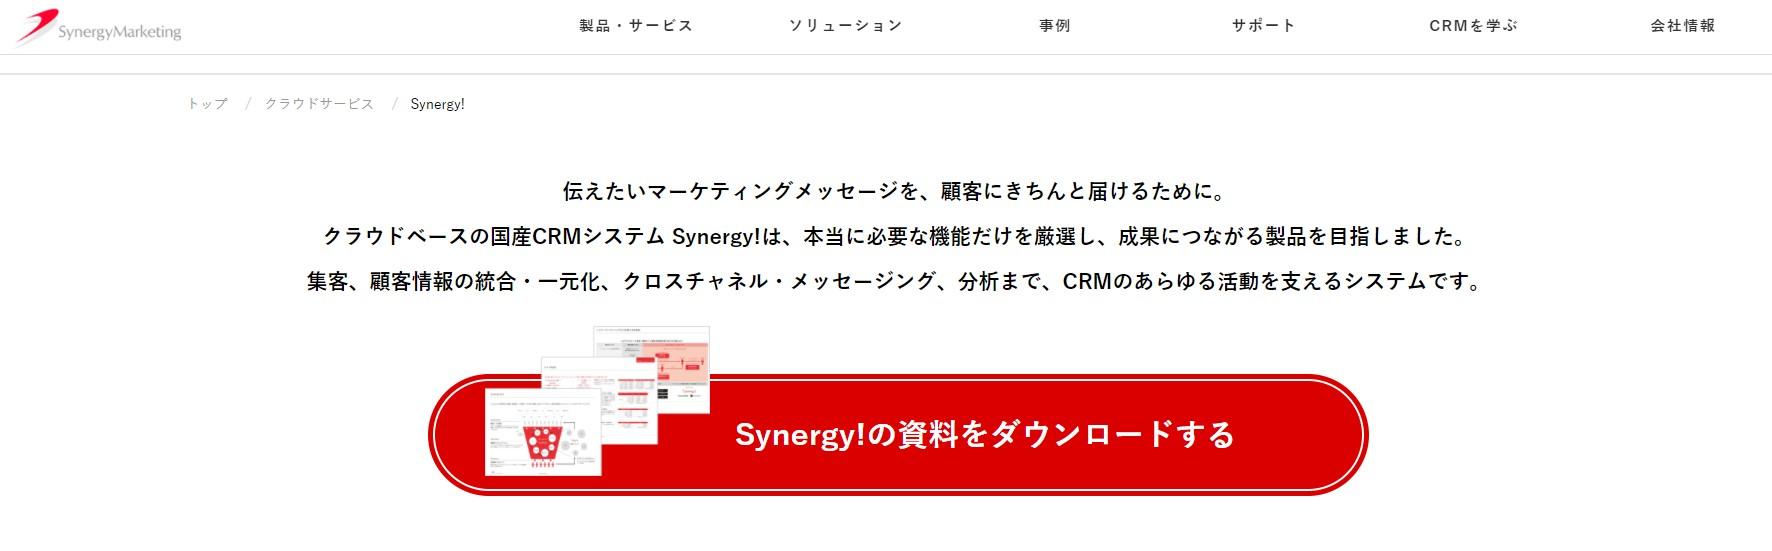 img_synergy.jpg